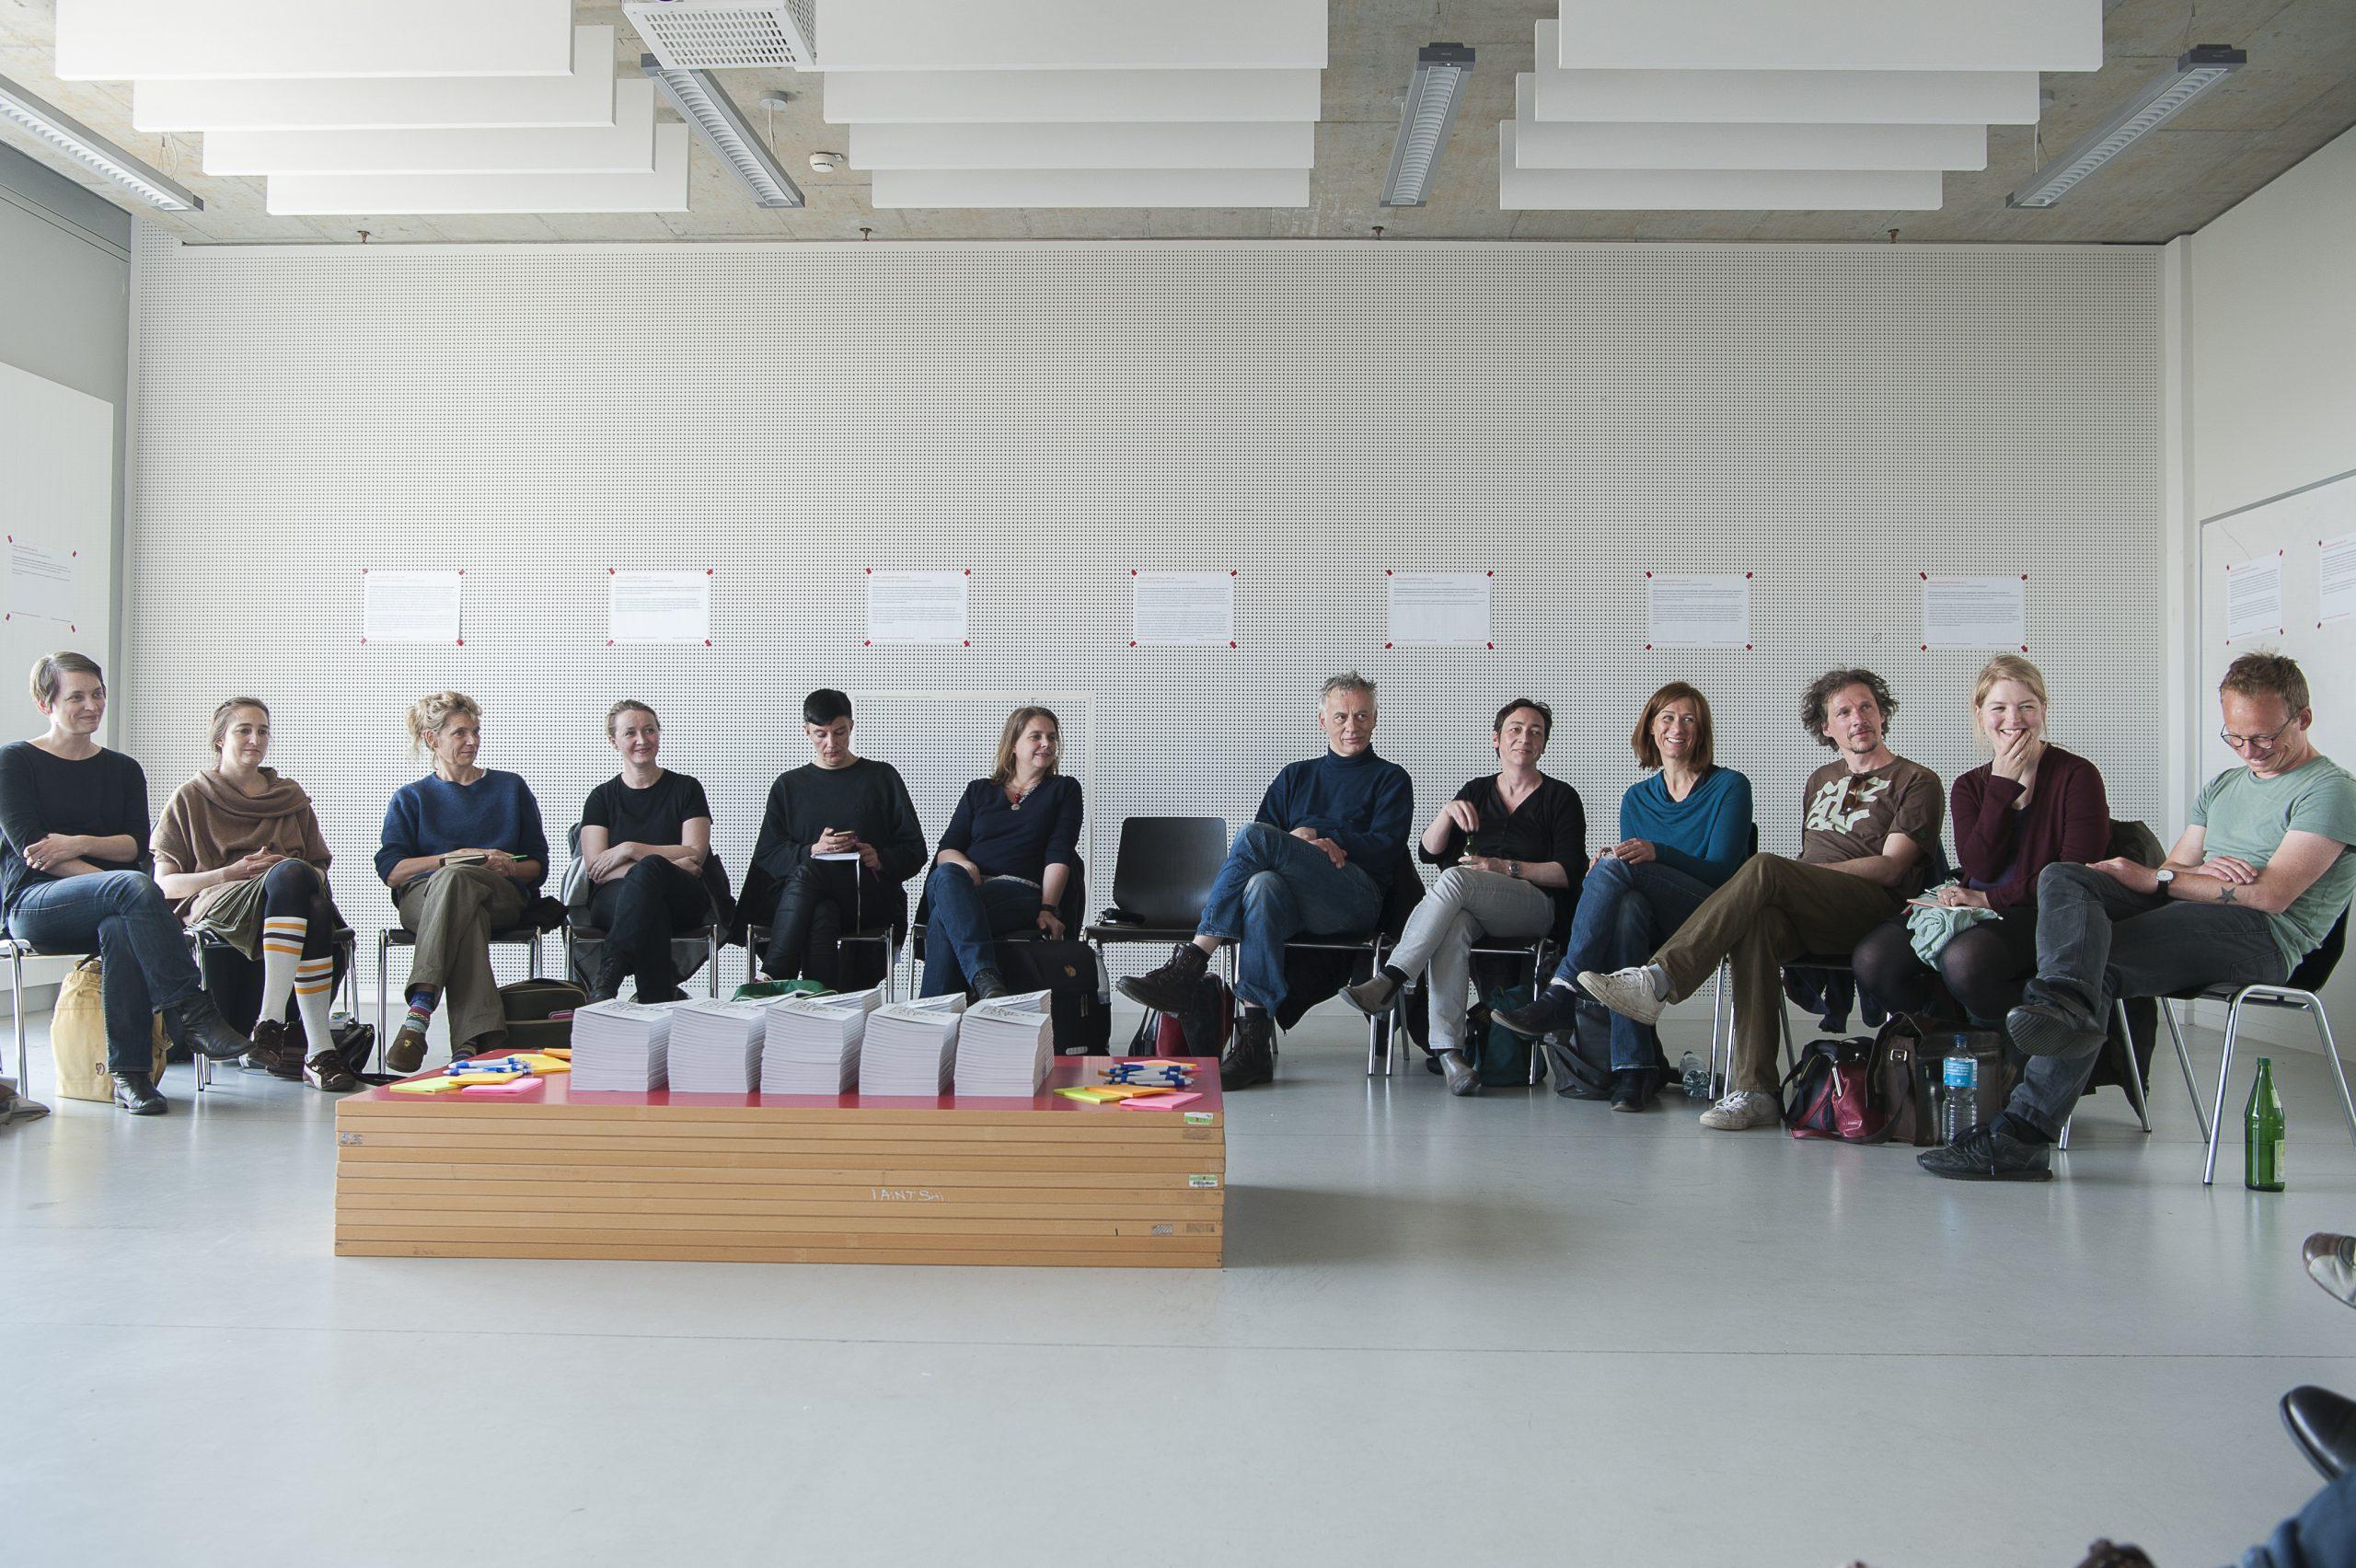 Michael Ziehl, Future Viability through Cooperation: The Renovation of the Gängeviertel/Laboratory Report, 2017, Hamburg